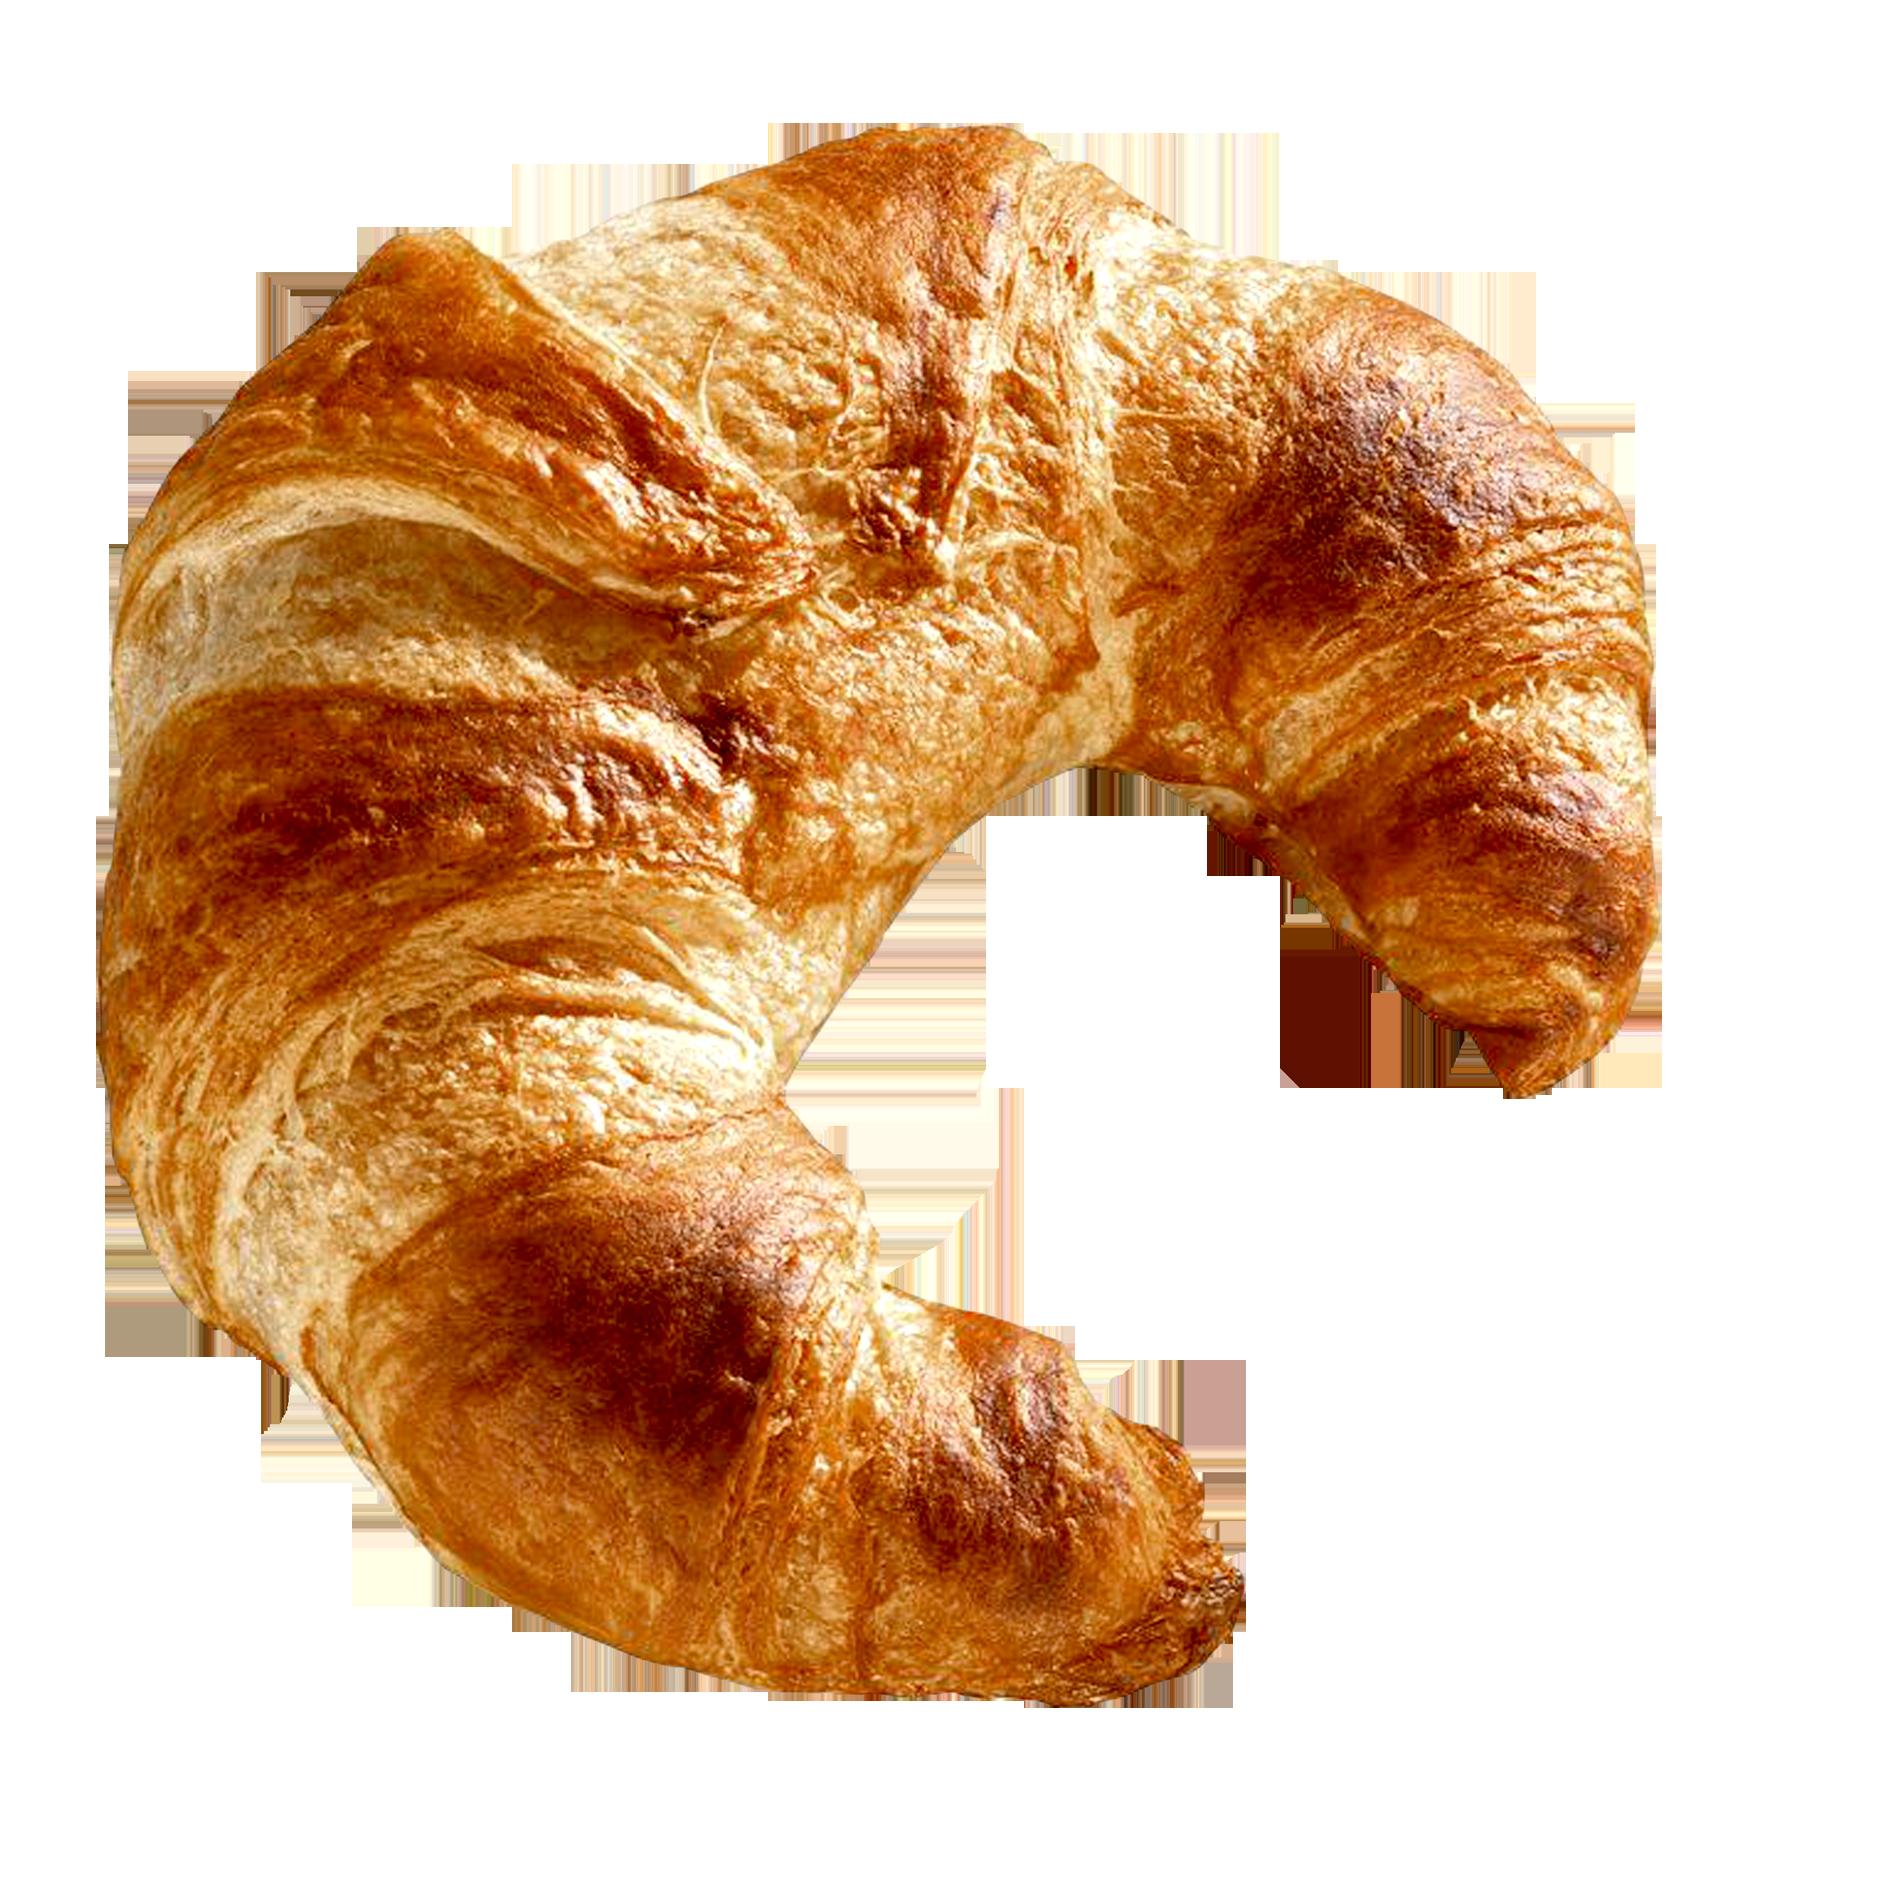 vector free download Croissant transparent. Background png arts .